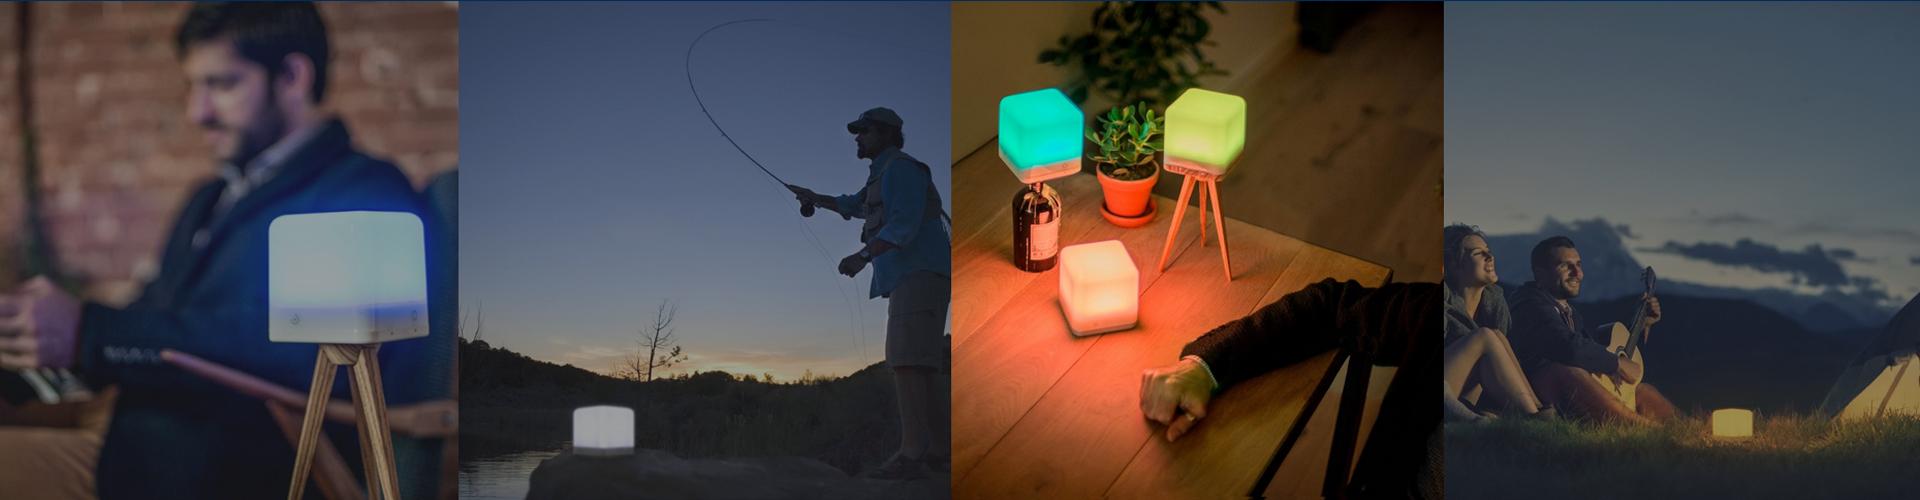 A wireless lamp